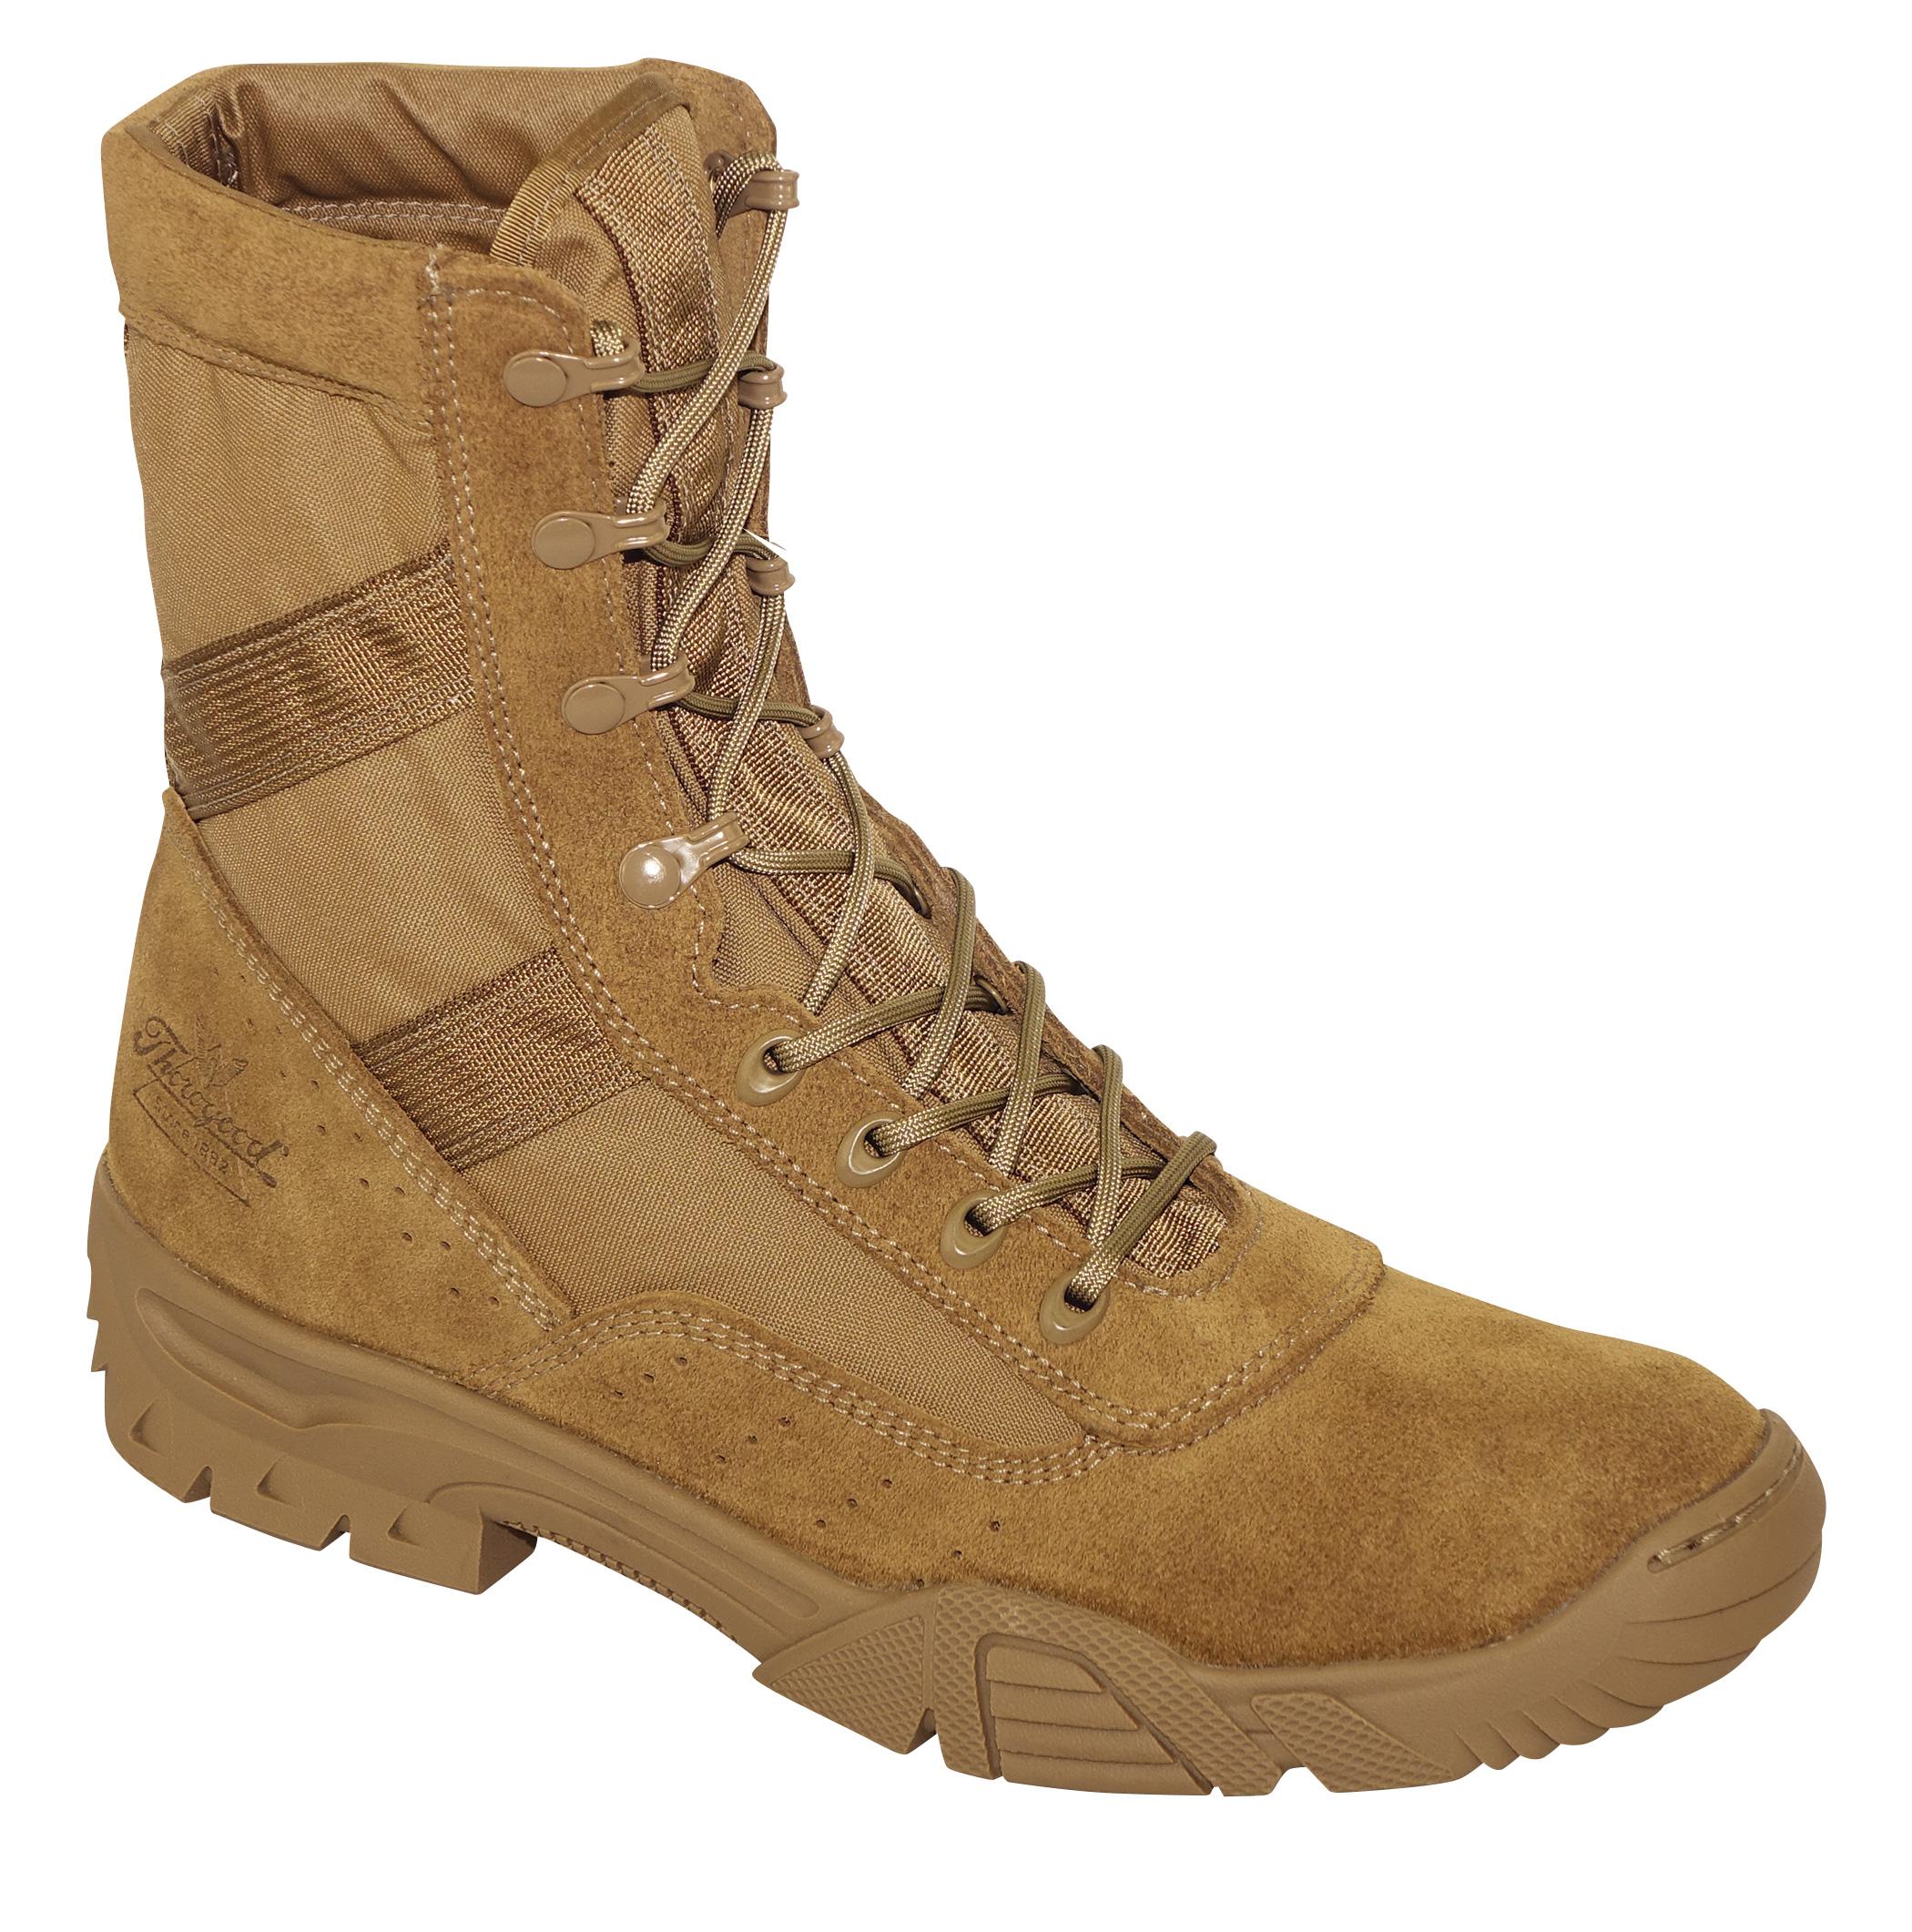 7210aae19c9 Thorogood Mens Saw 8in Military Boot